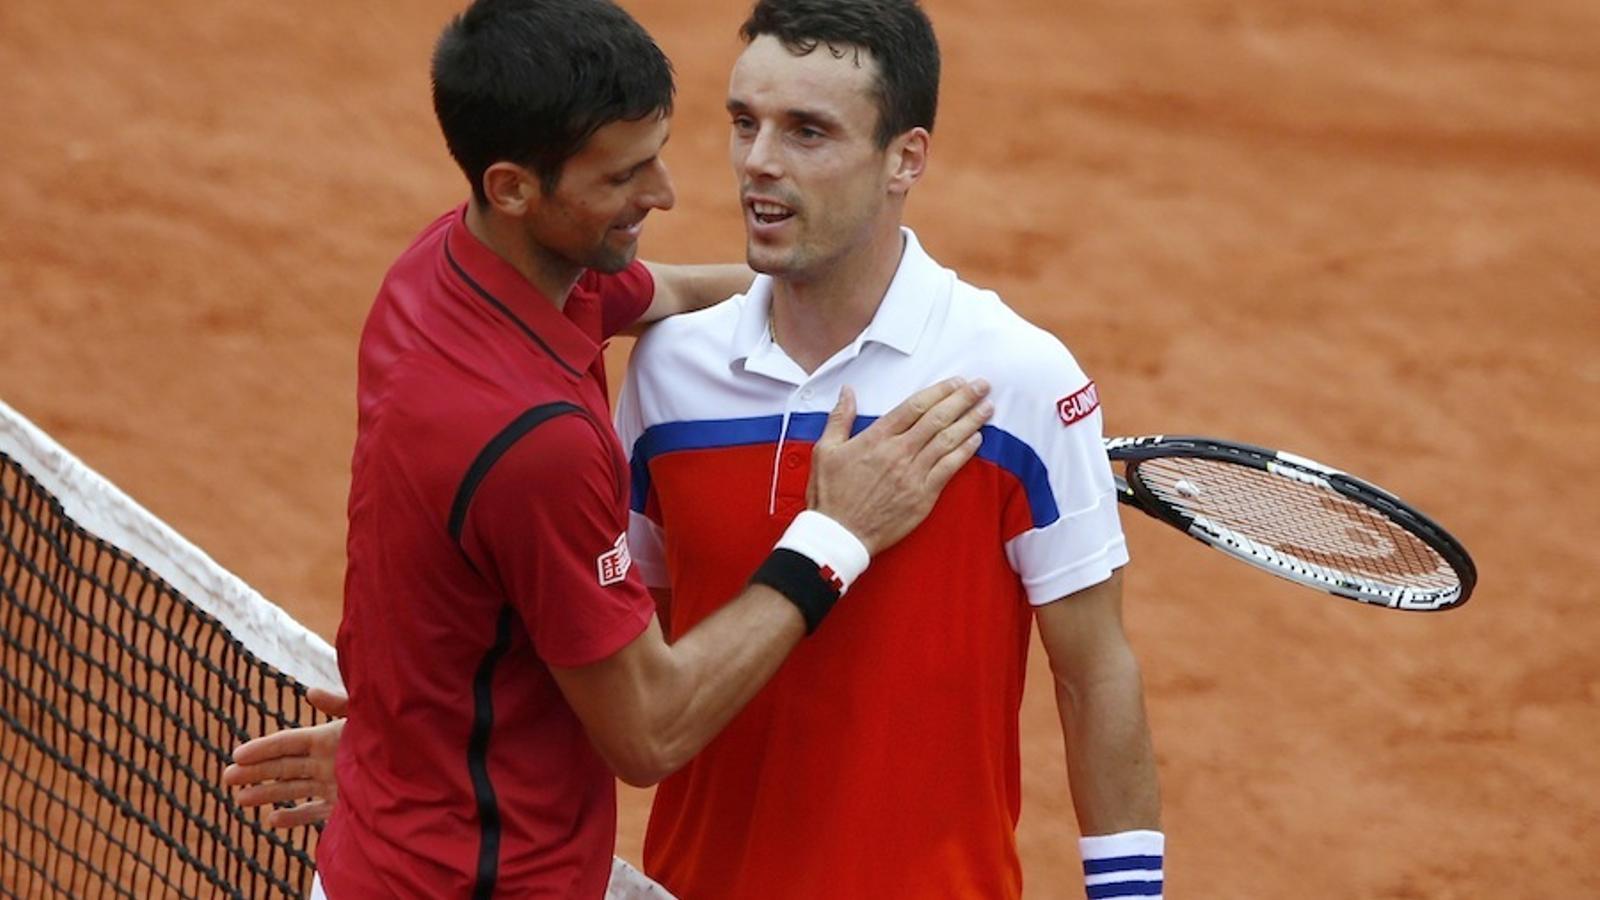 Bautista, Granollers i Ferrer s'acomiaden de Roland Garros